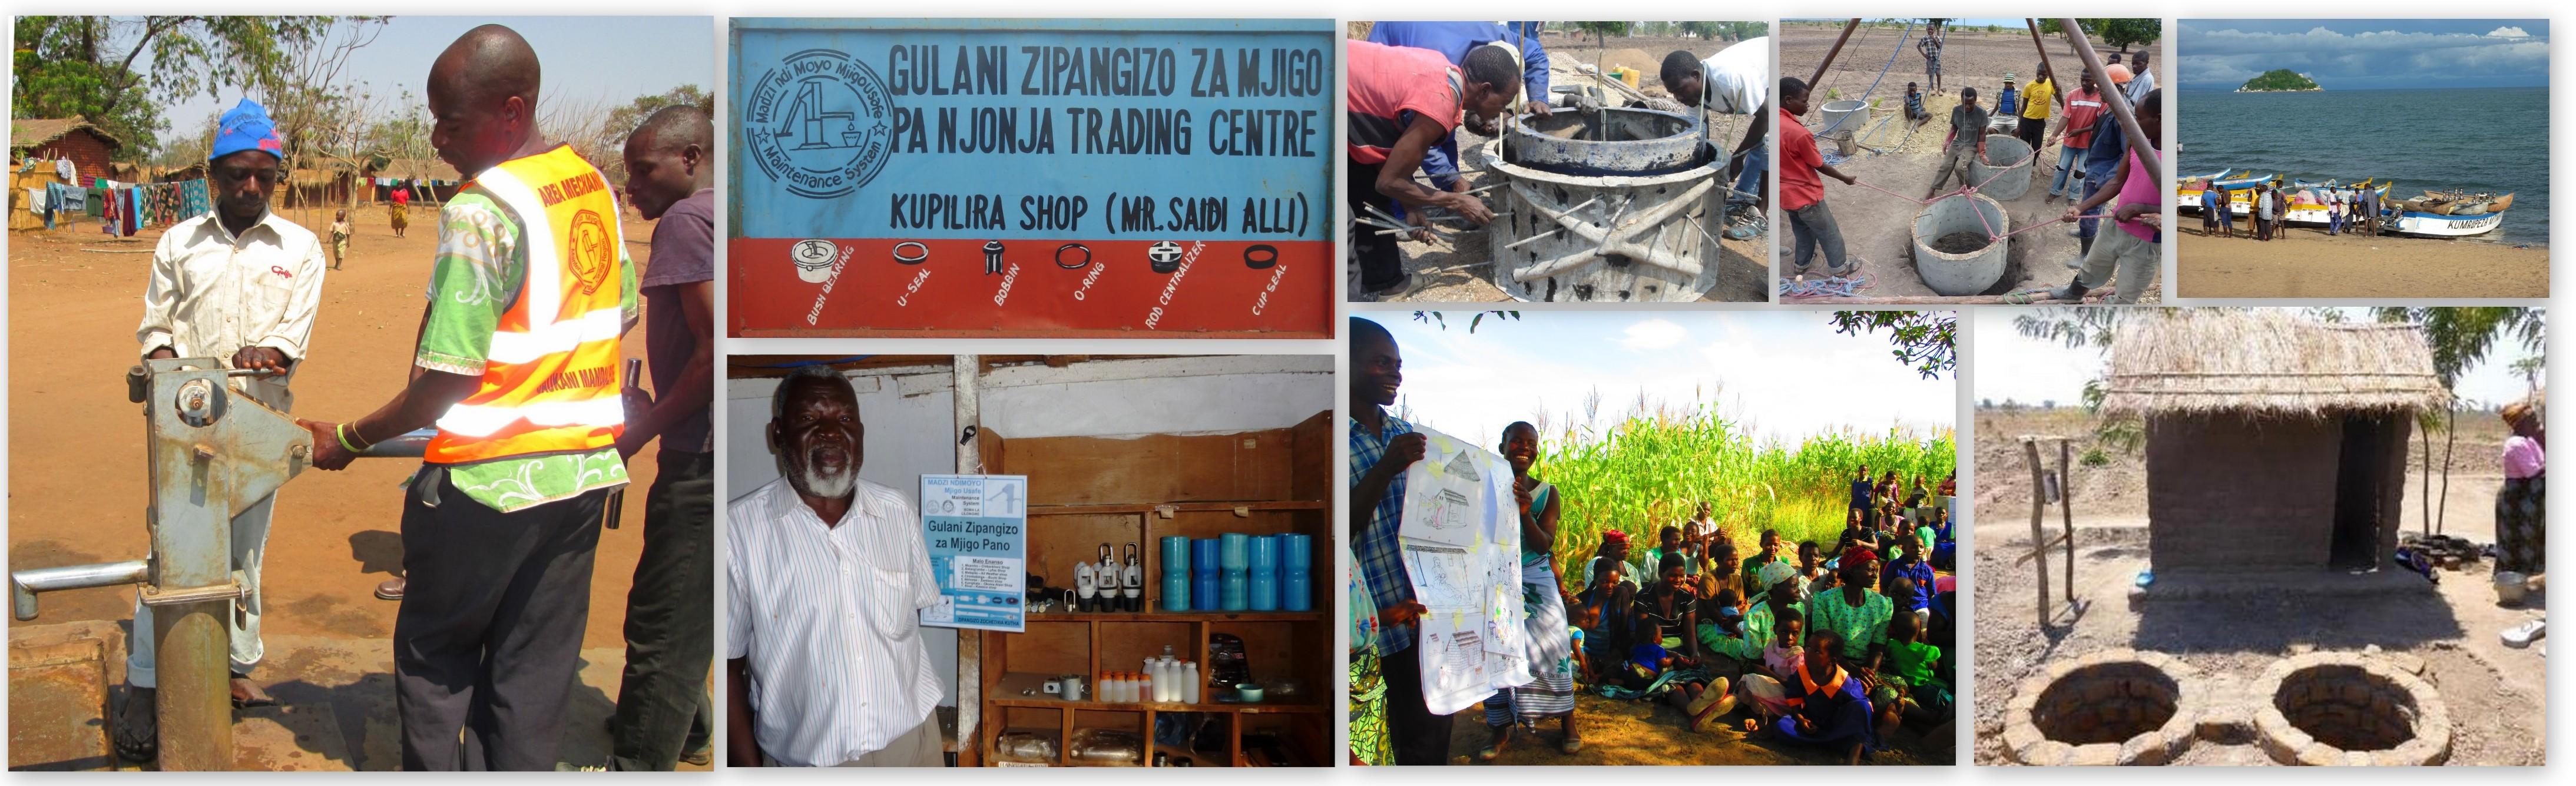 hand pump Maintenance, water and sanitation in Malawi